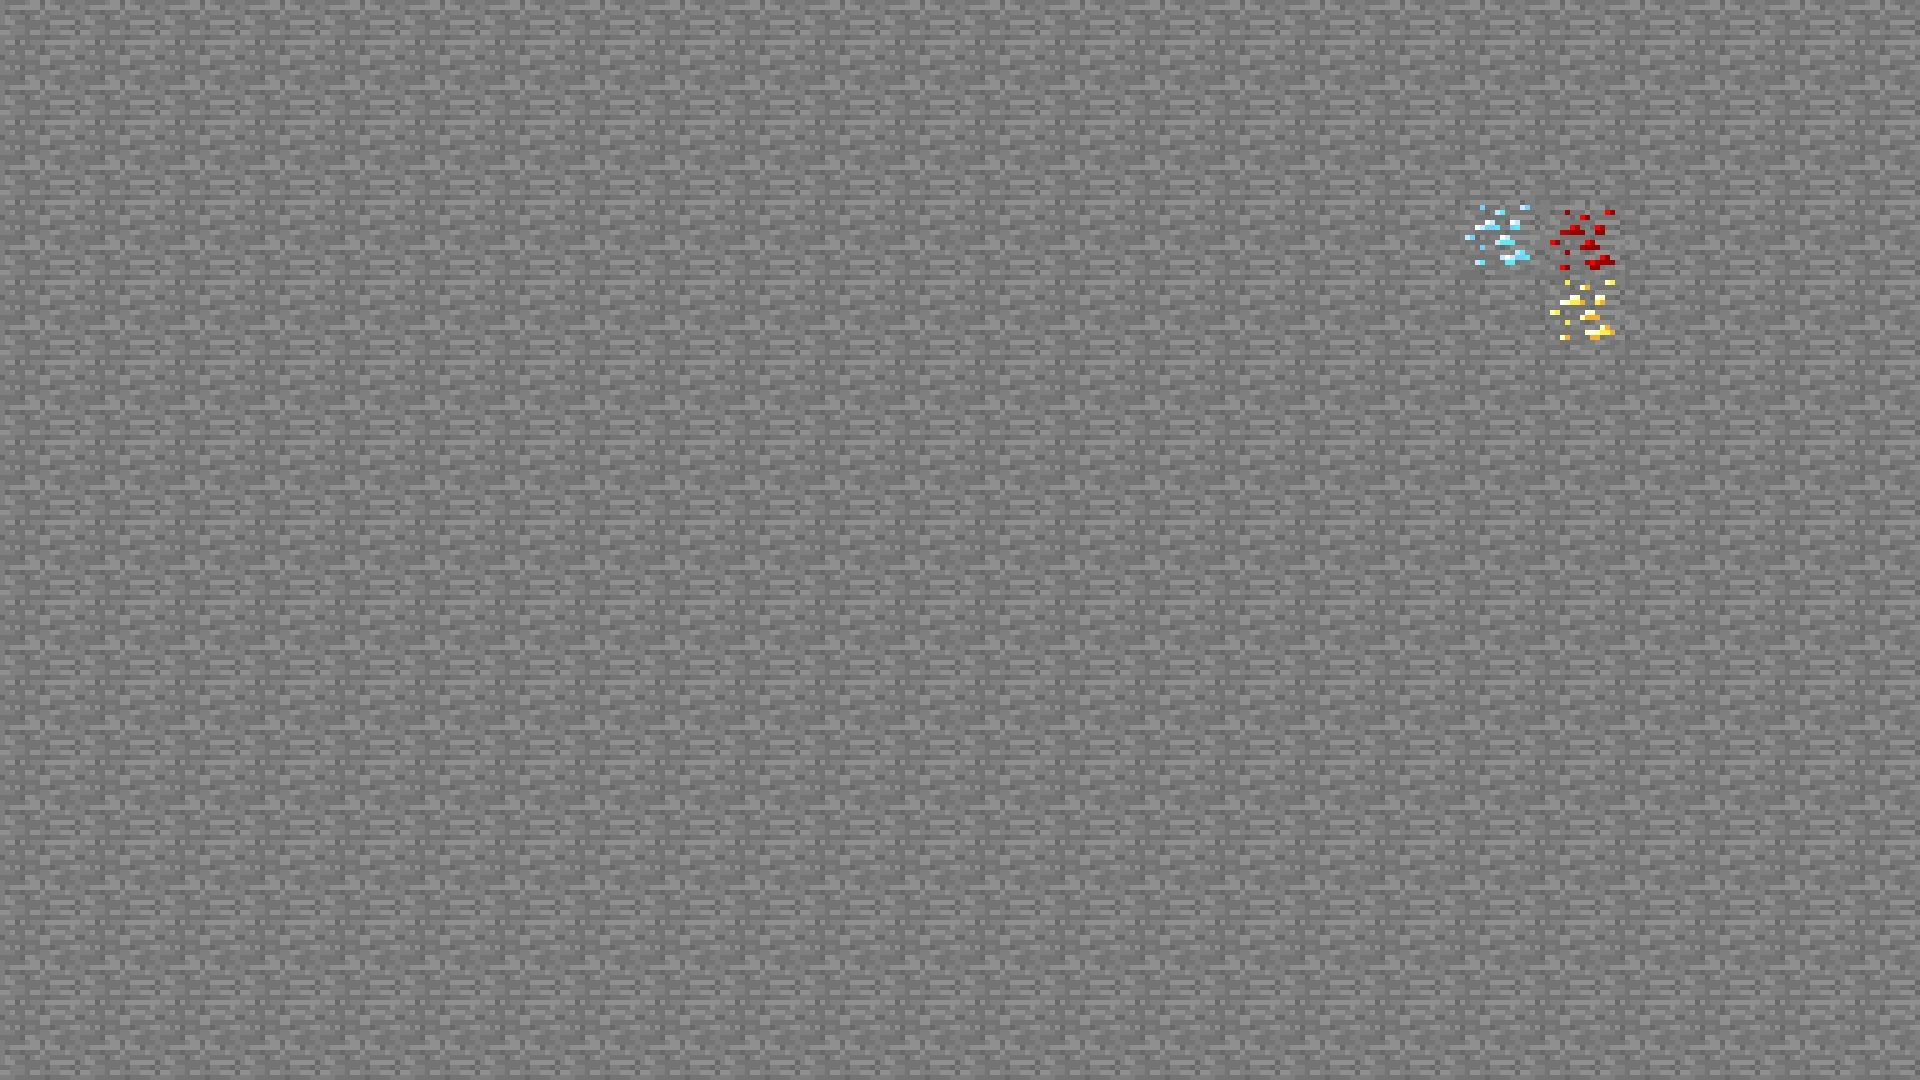 Minecraft Diamond Ore Basic Wallpaper Minecraft Wallpaper